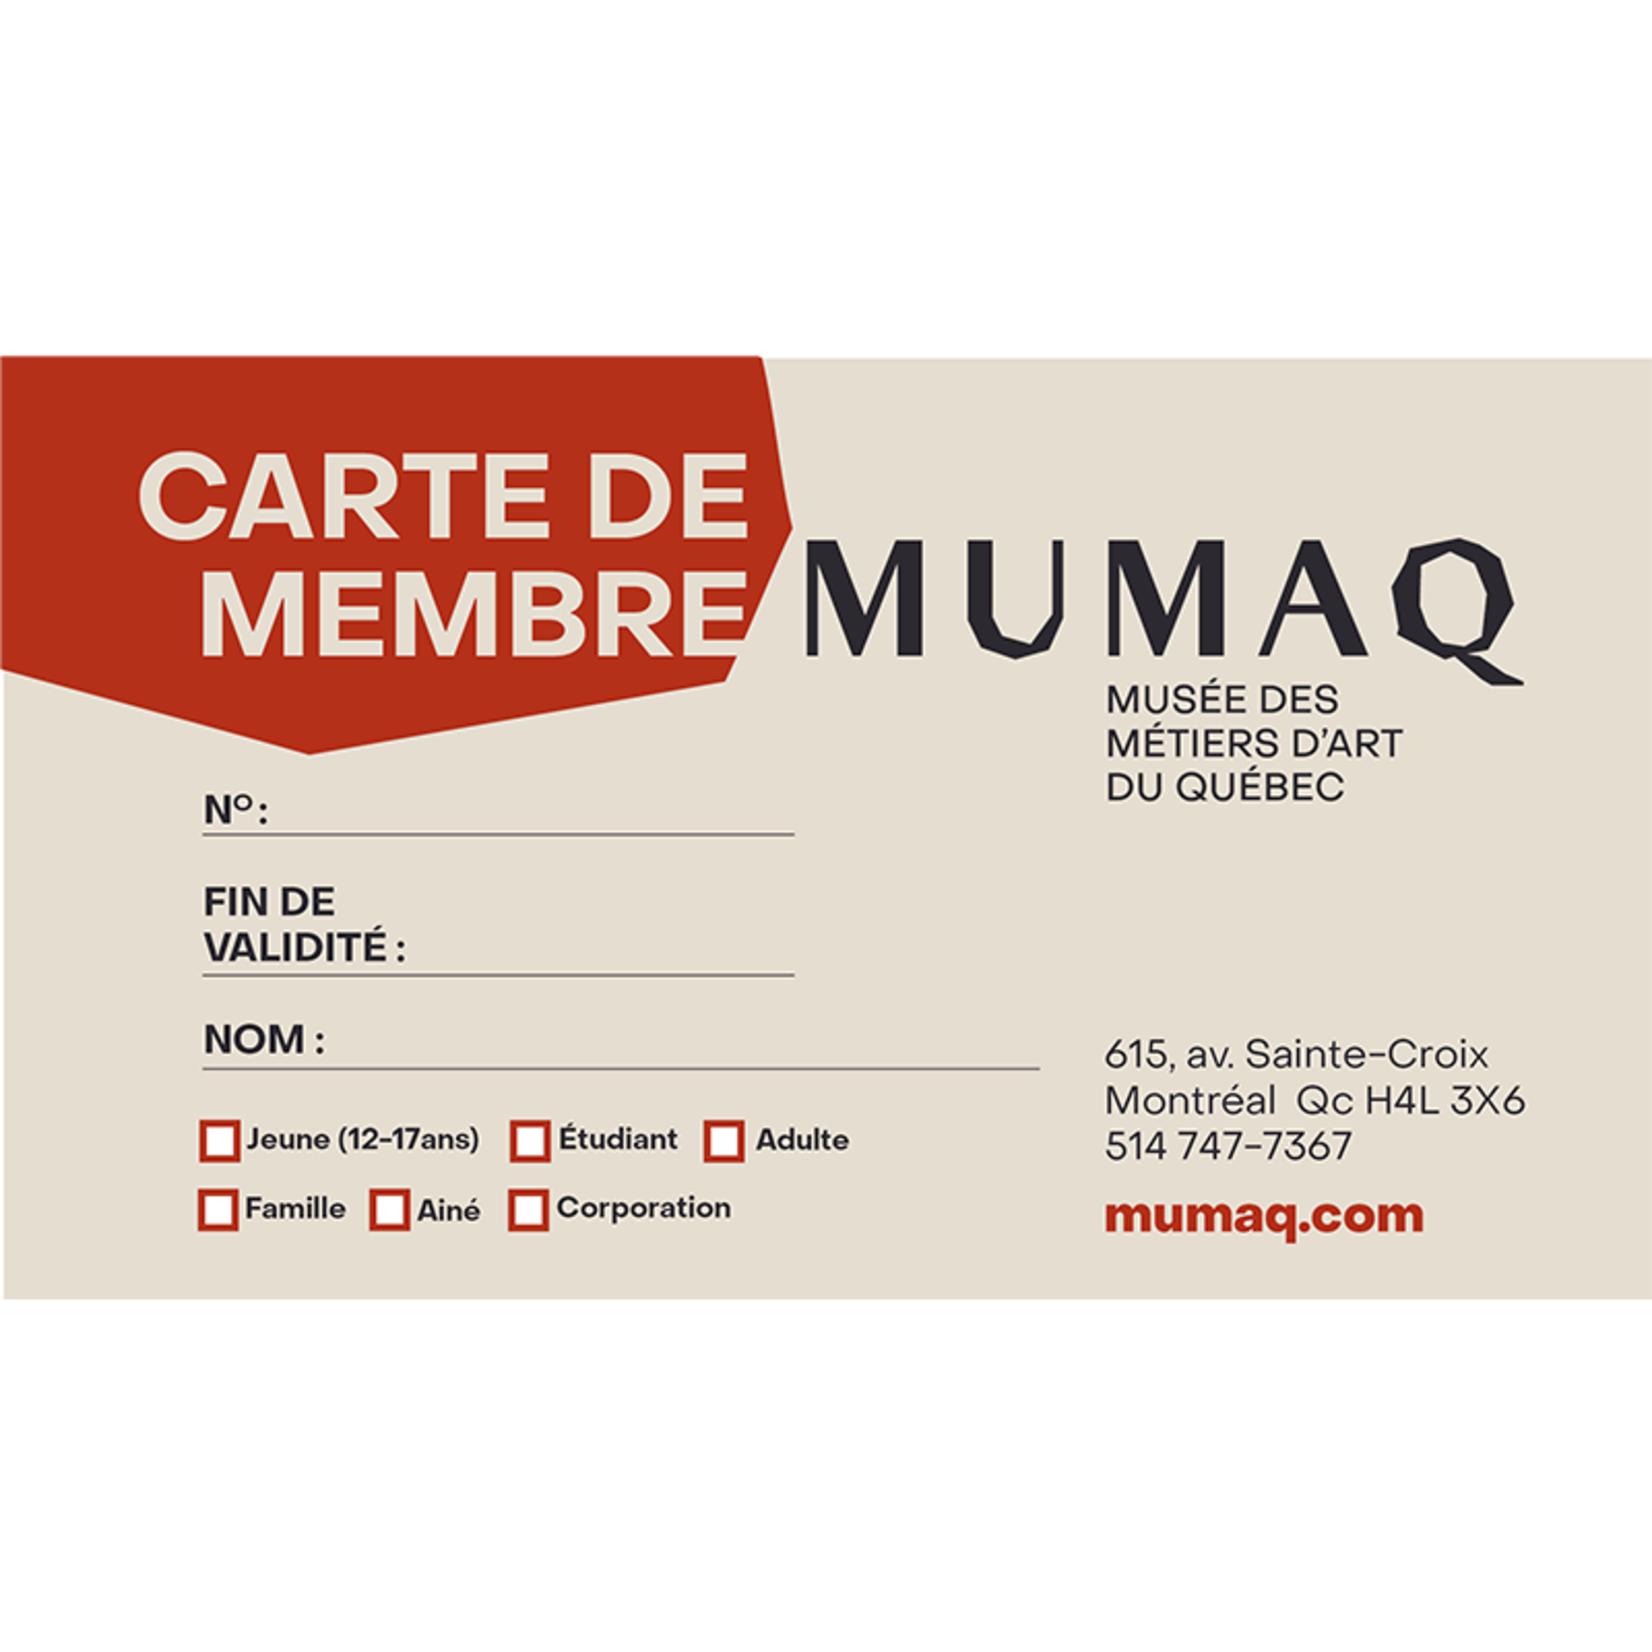 2 years membership card - Adult